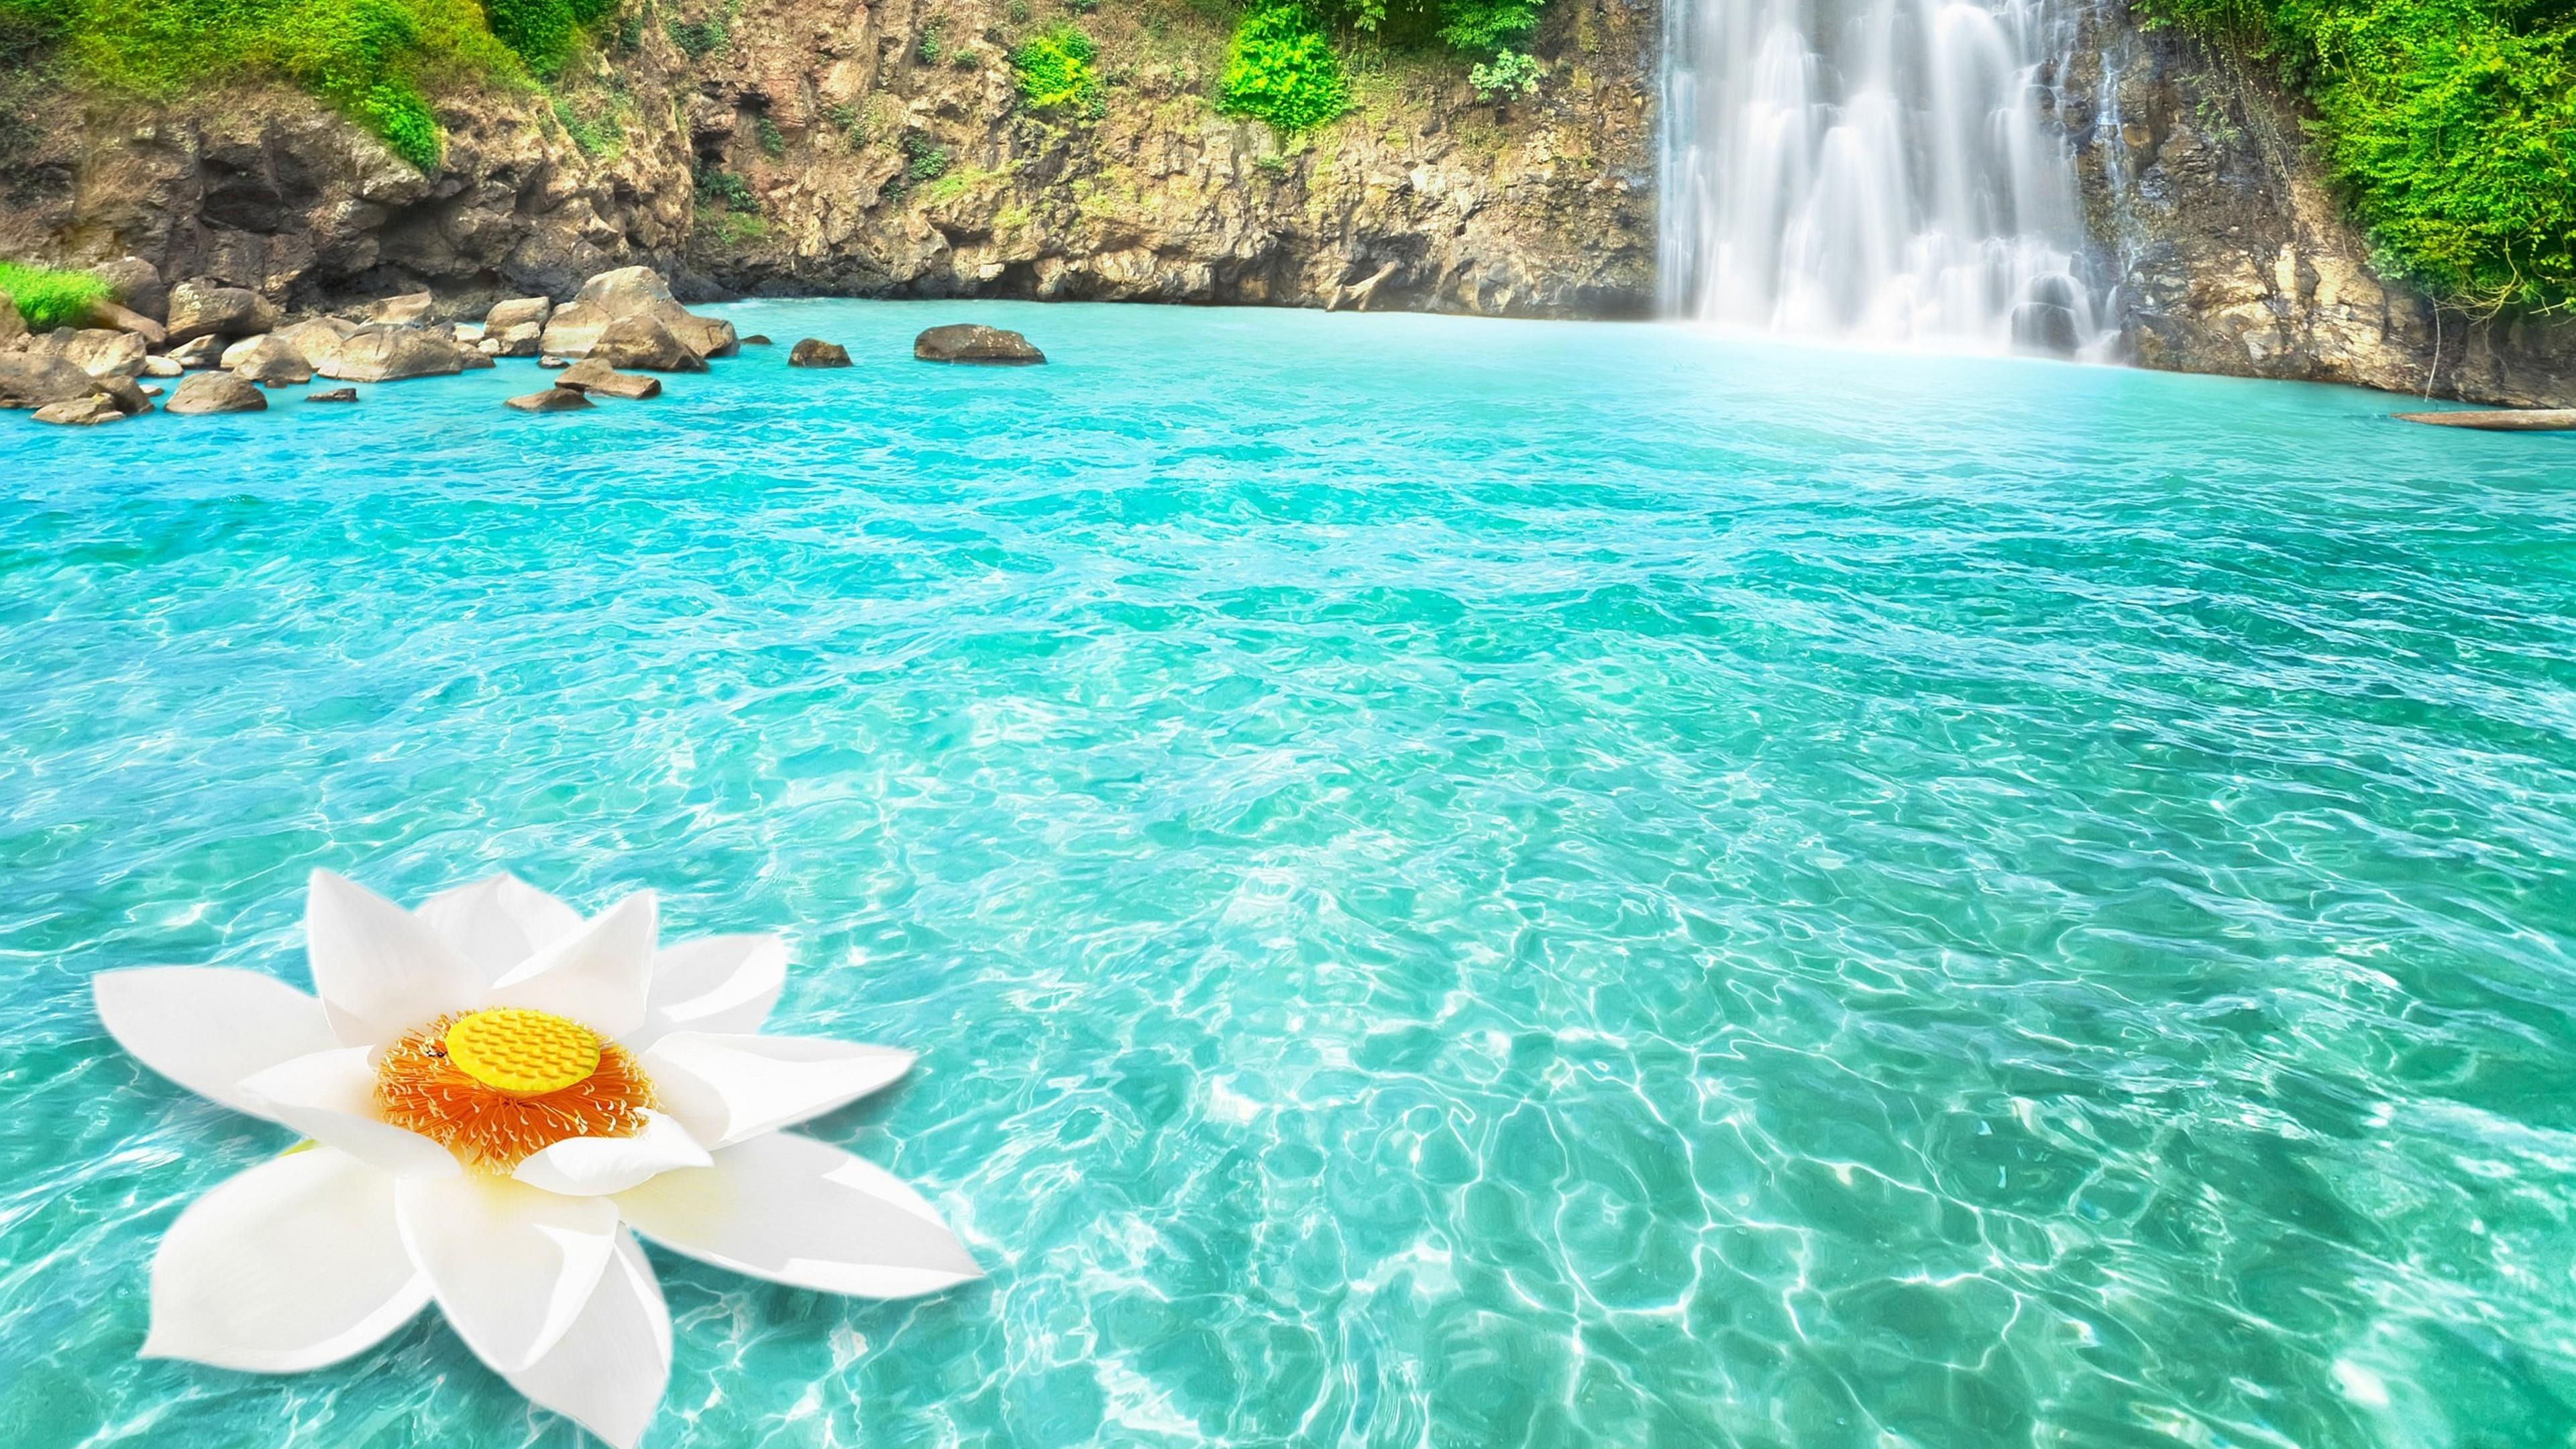 waterfall flowers 1540131342 - Waterfall Flowers - waterfall wallpapers, nature wallpapers, lotus wallpapers, flowers wallpapers